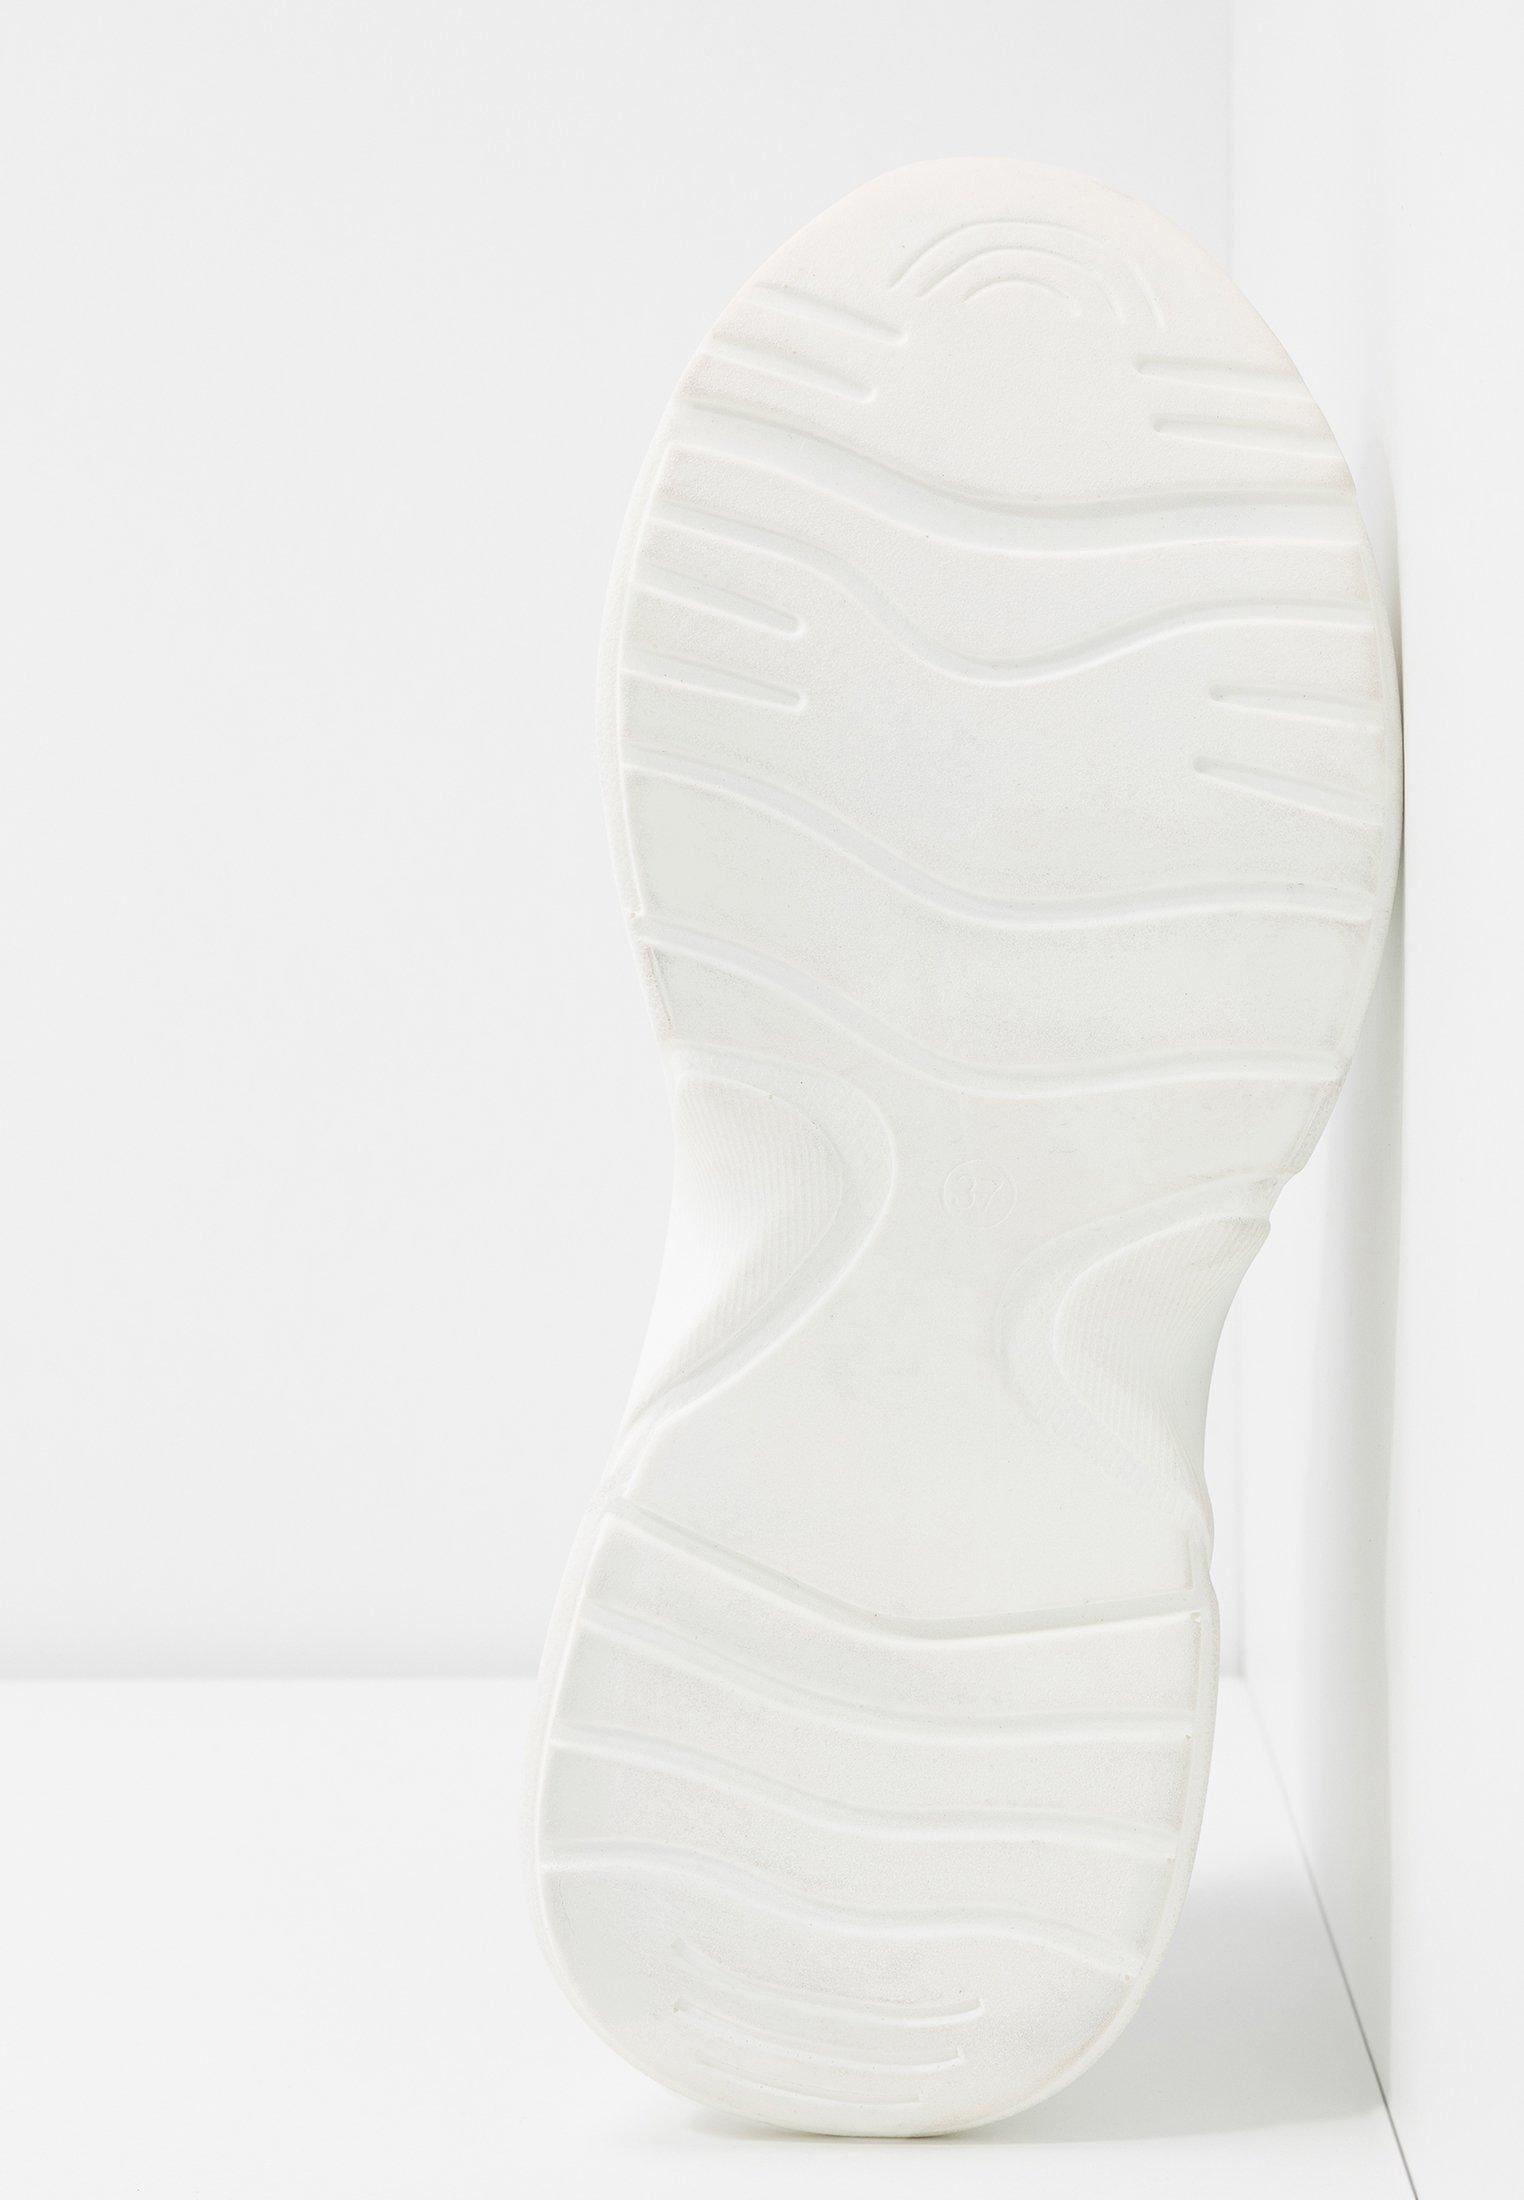 Basse Basse Sneakers Italia Sneakers White White Tata Italia Tata Italia Tata SUVpGMqz